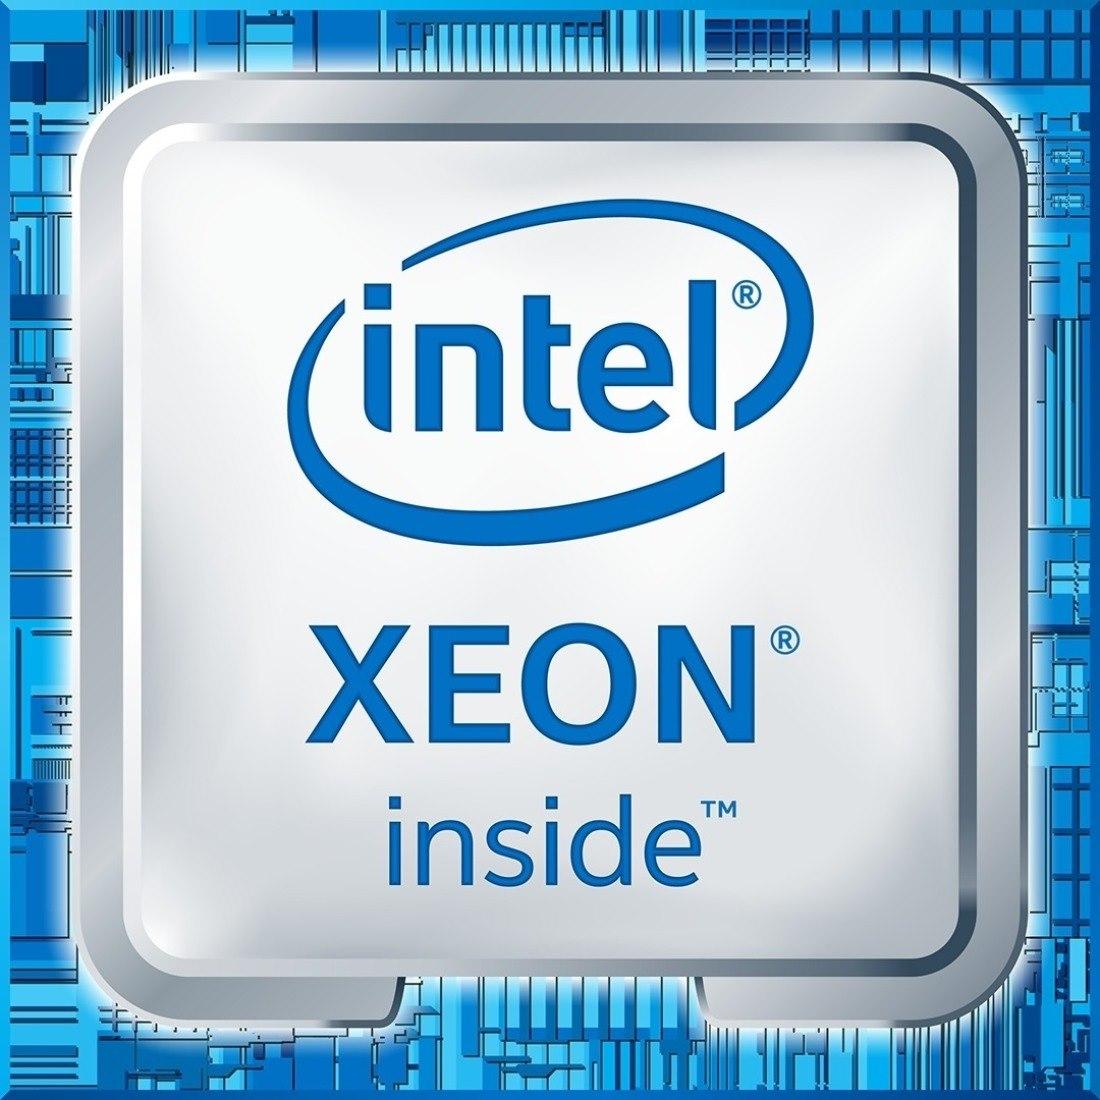 Intel Xeon E5-2637 v4 Quad-core (4 Core) 3.50 GHz Processor - OEM Pack